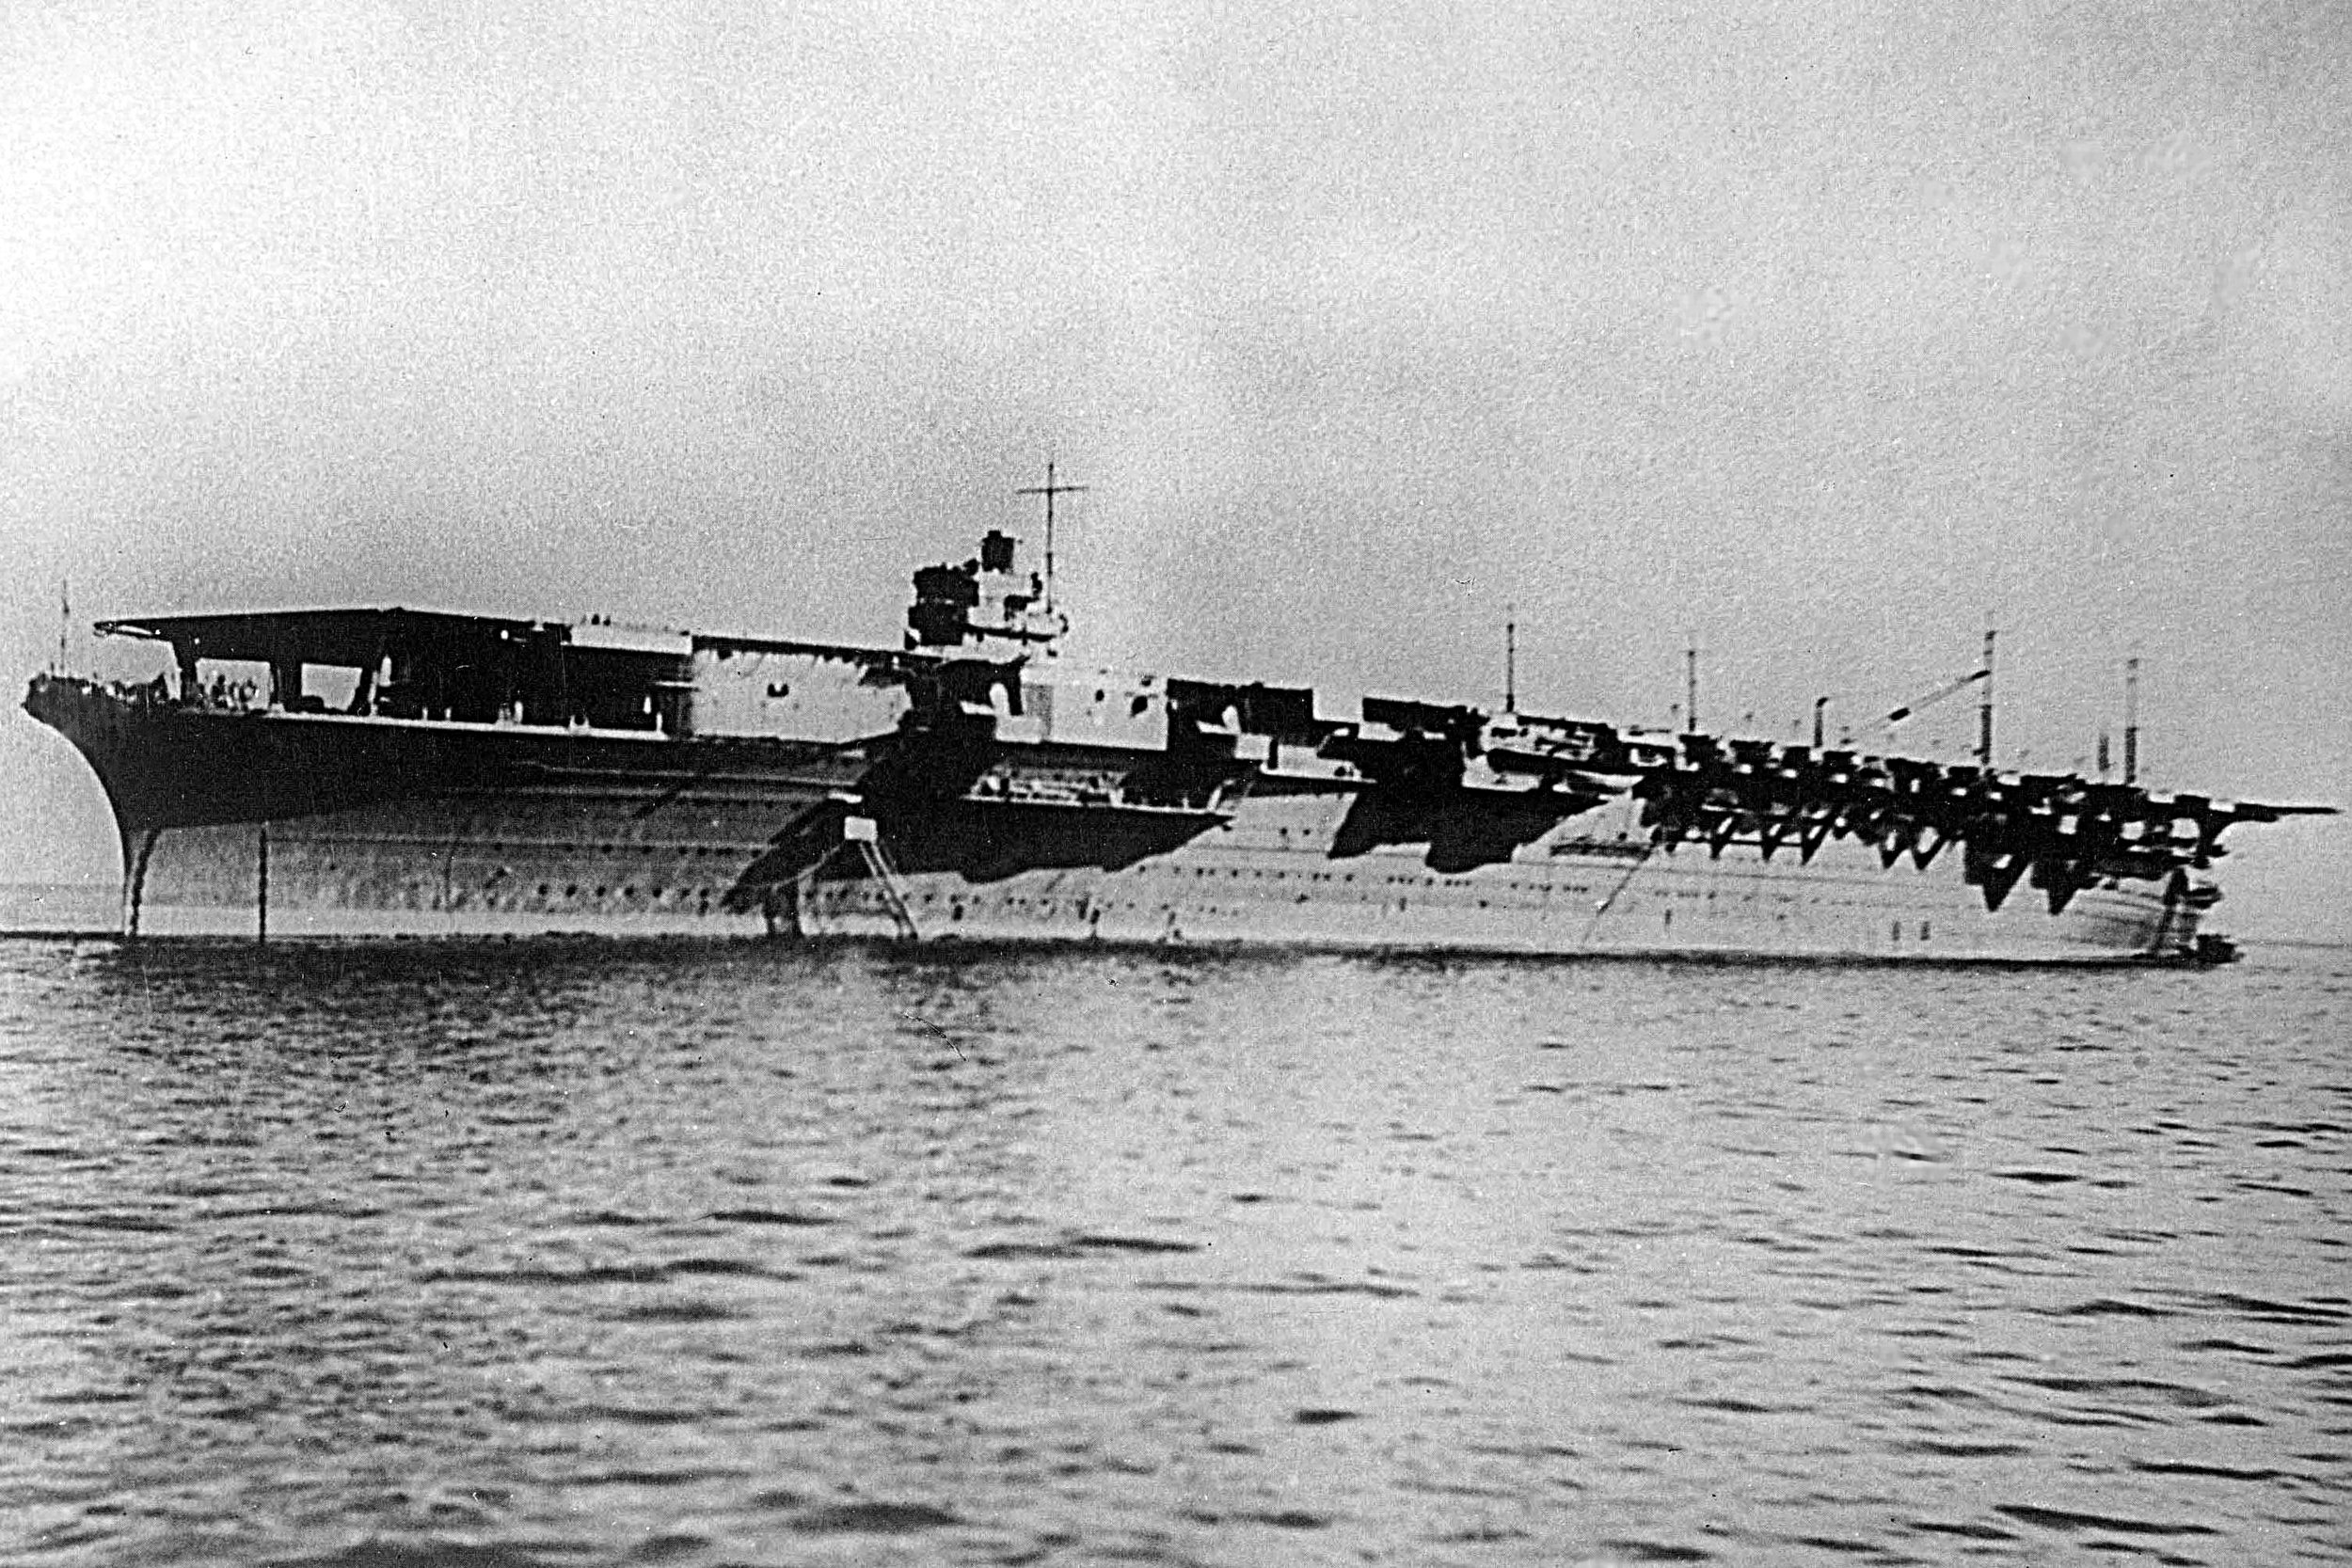 IJN Shokaku represented the template upon which future Japanese fleet carrier designs were based.